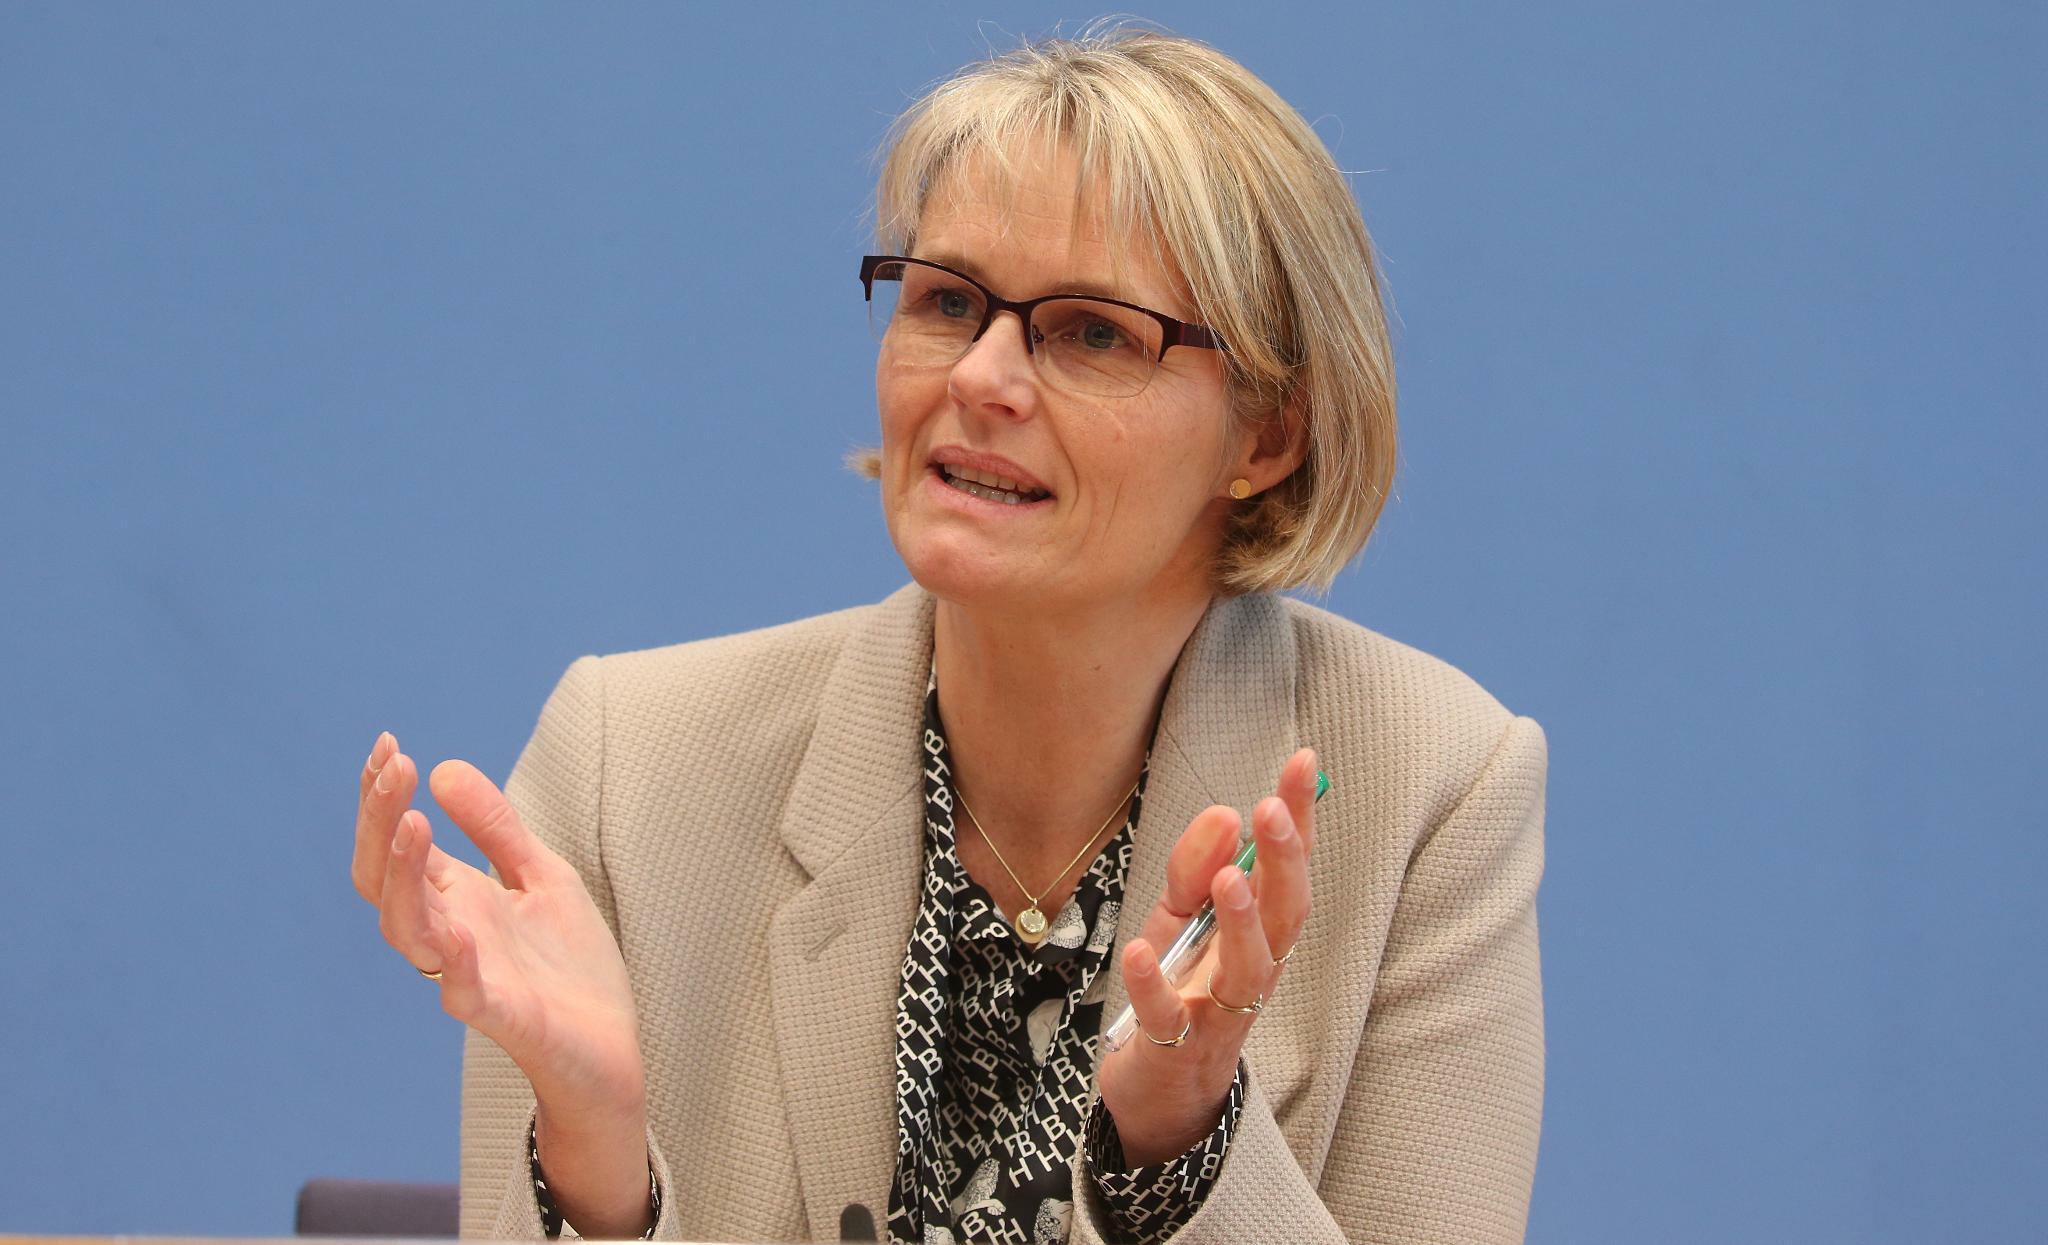 Forschungsministerin plant Wasserstoff-Partnerschaft mit Australien